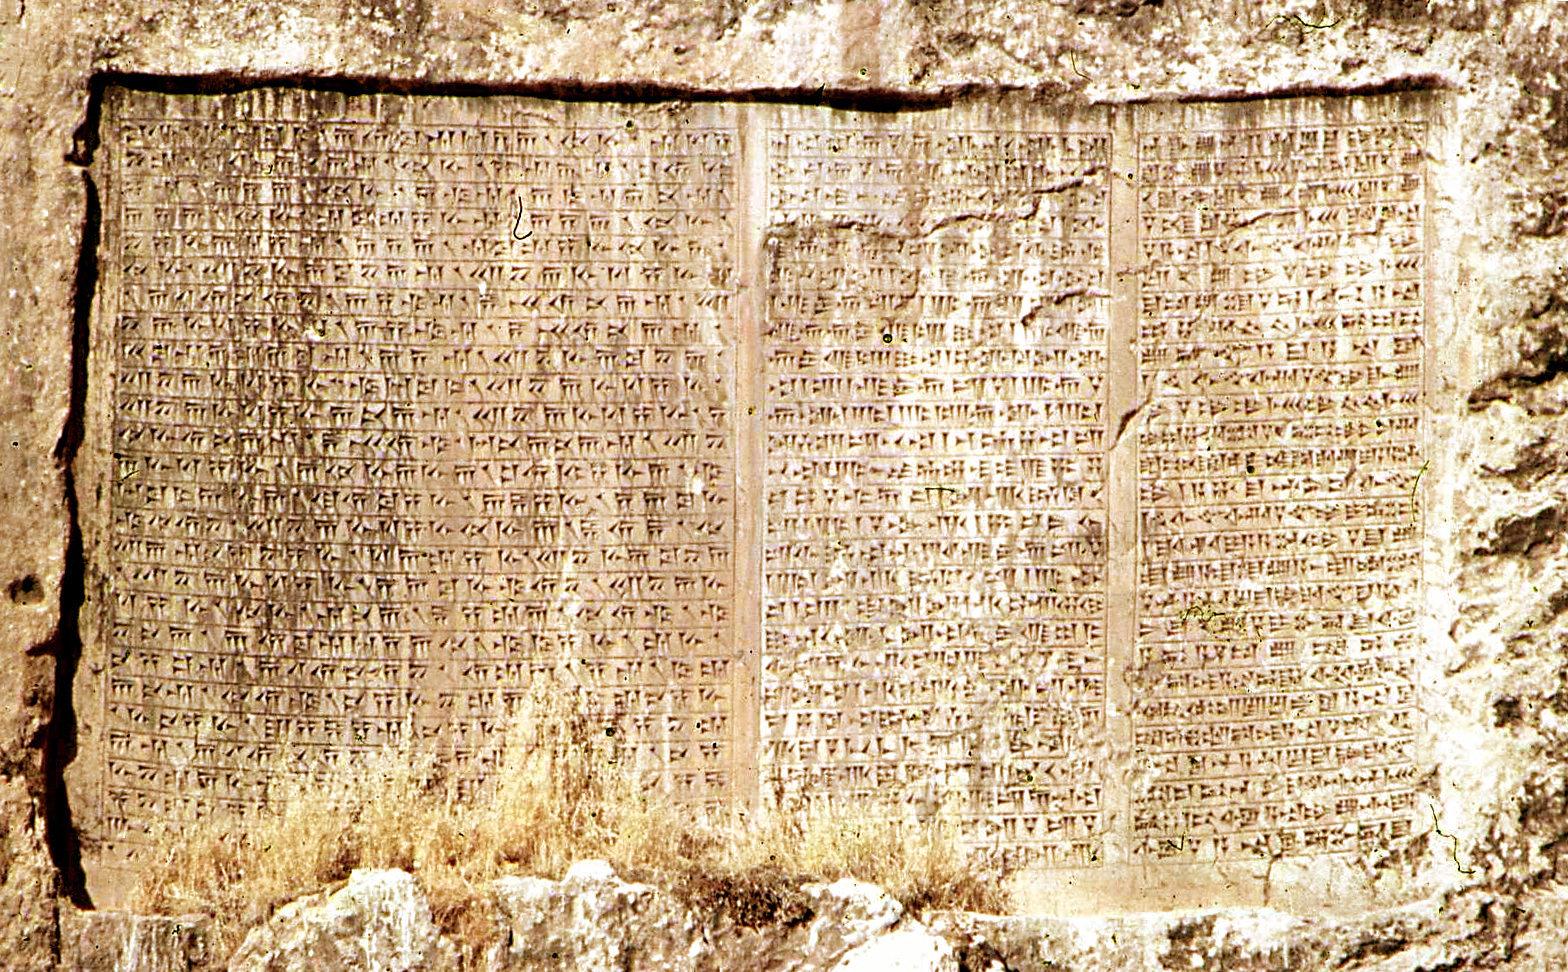 BABYLONIAN WRITING SYSTEM